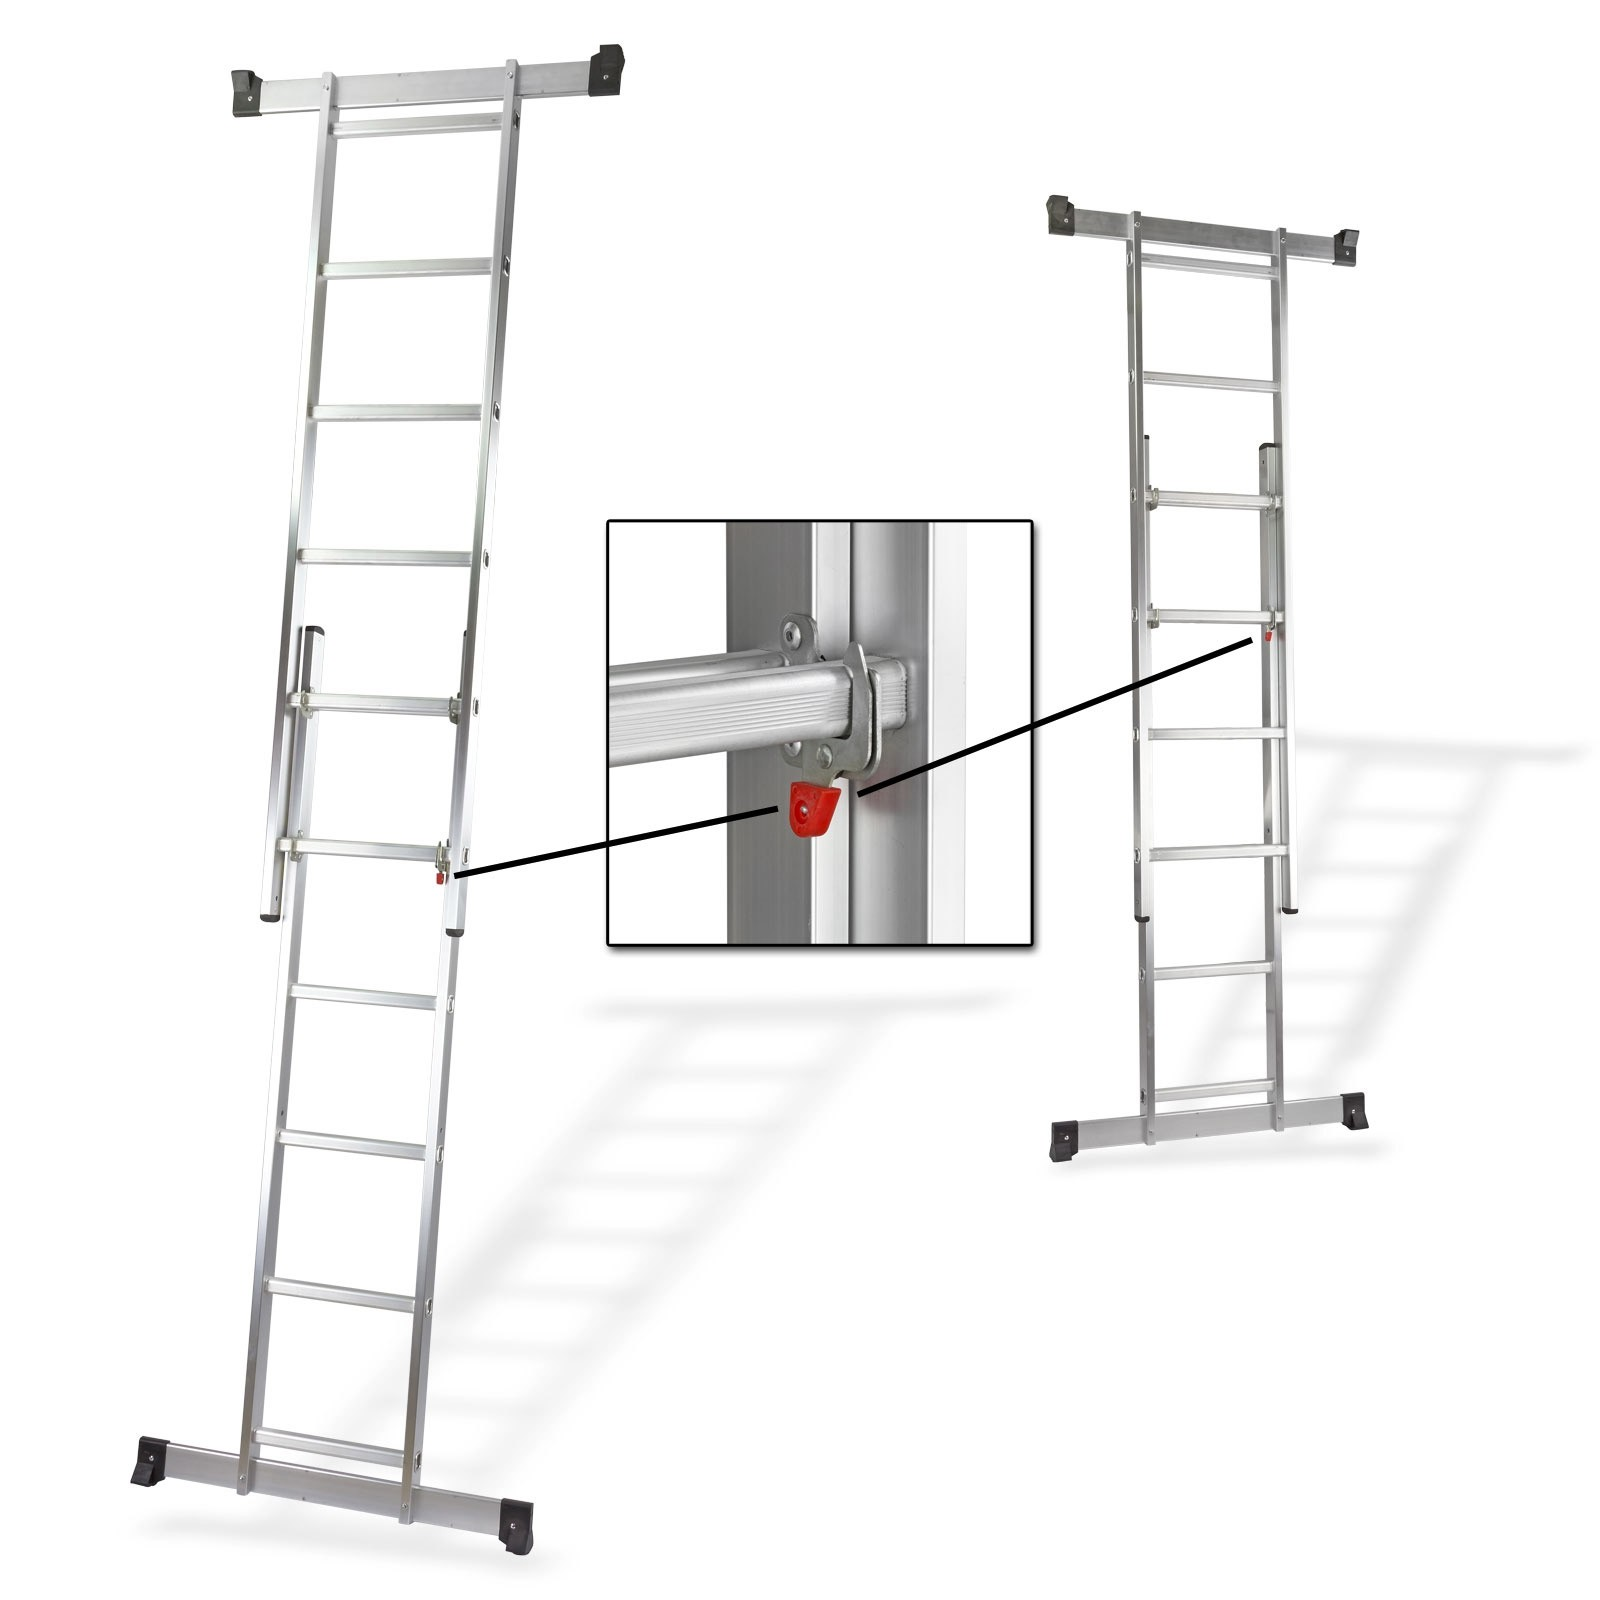 3 in 1 ger stleiter leiter mit plattform. Black Bedroom Furniture Sets. Home Design Ideas